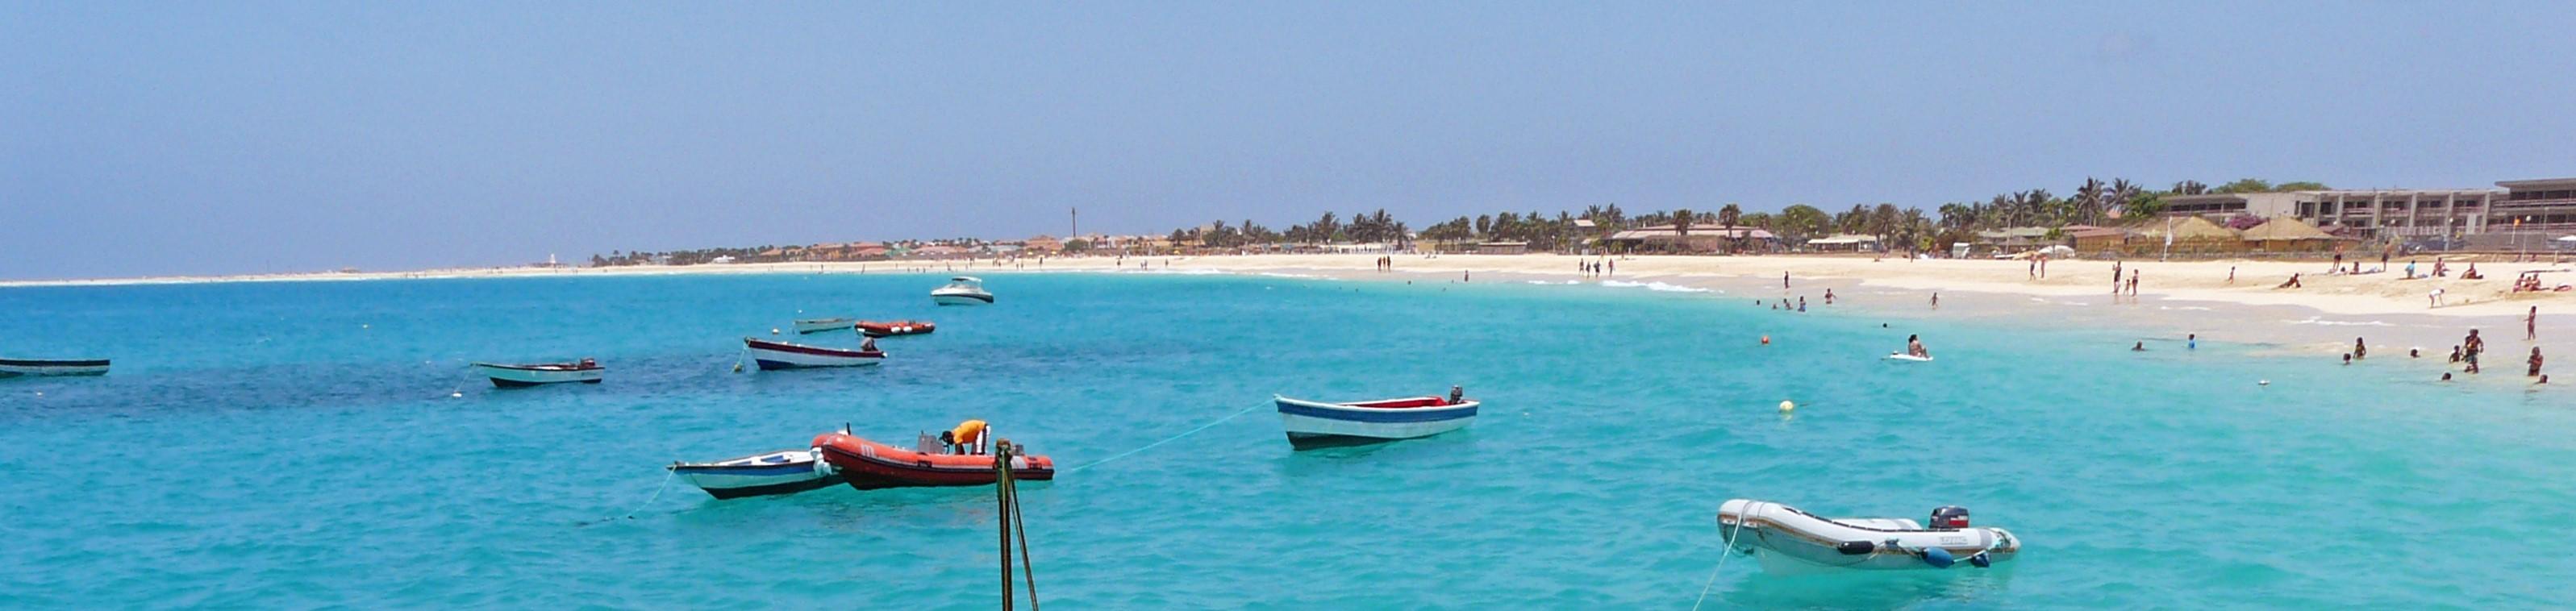 Wandelvakantie Kaapverdië